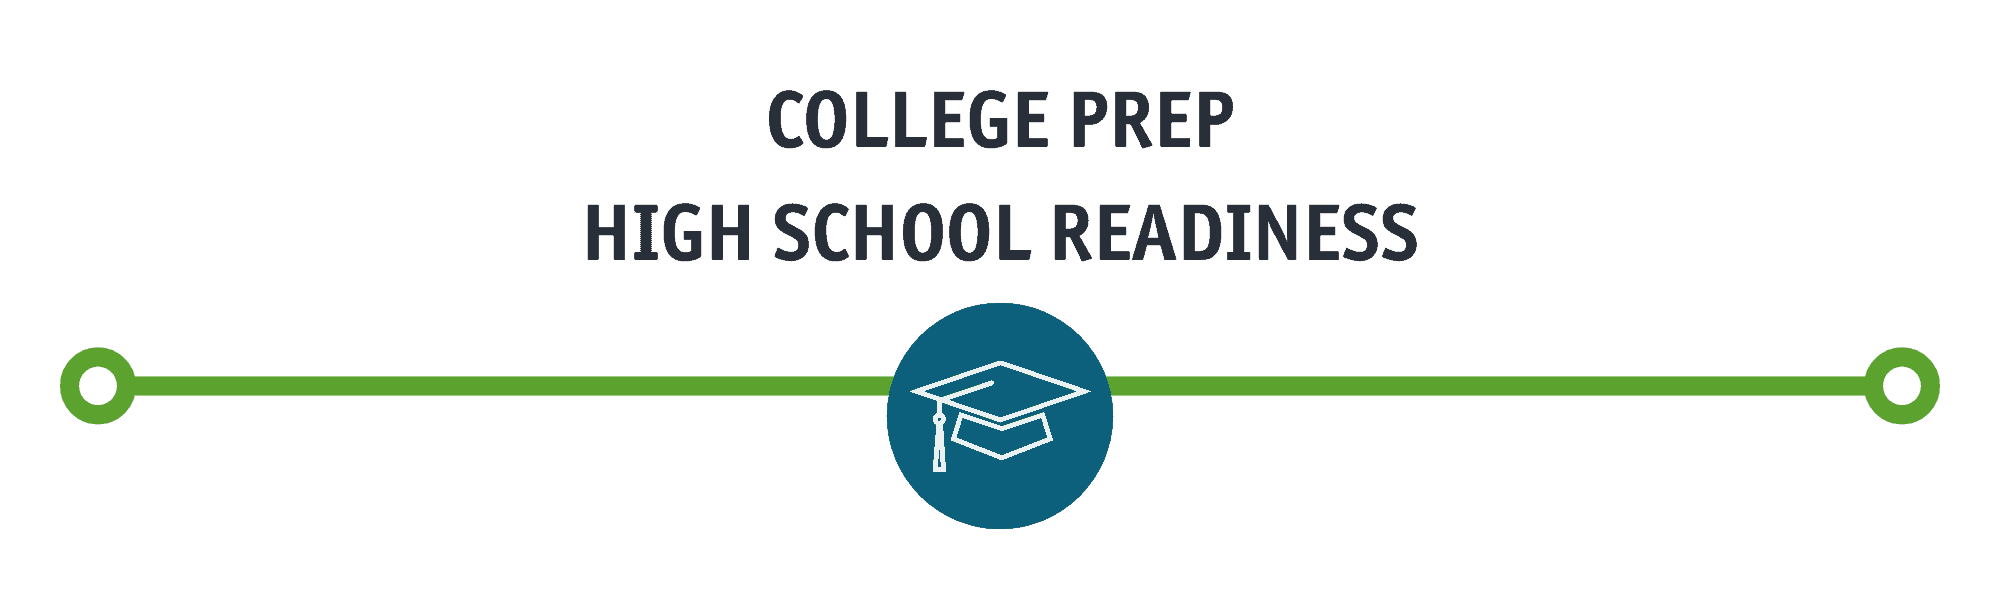 College Prep High School Readiness